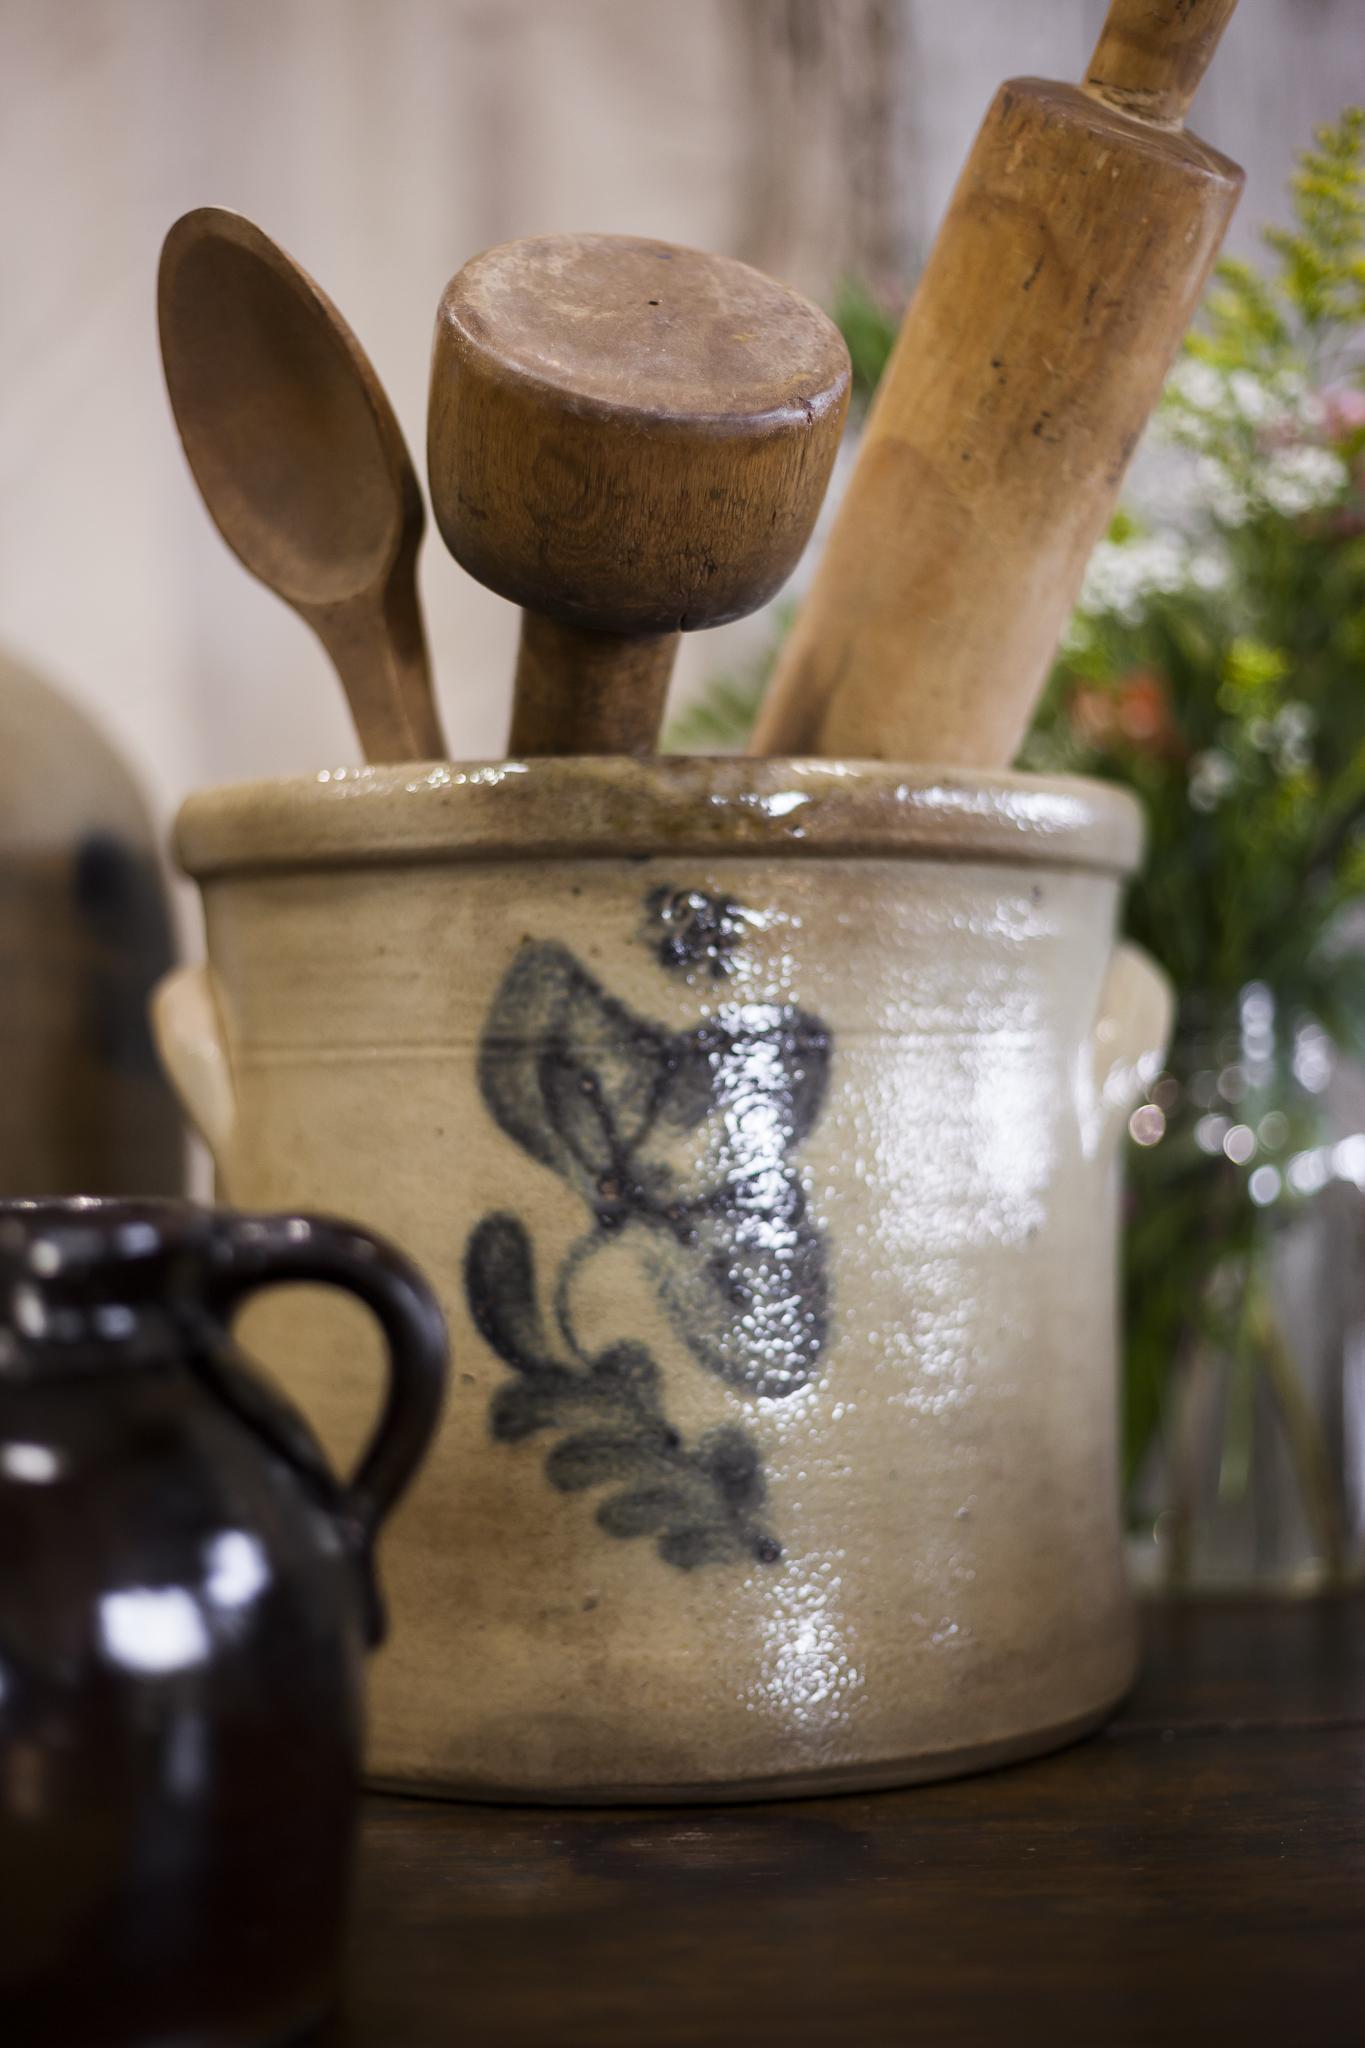 Authentic Antique Americana Western Kitchen Utensils